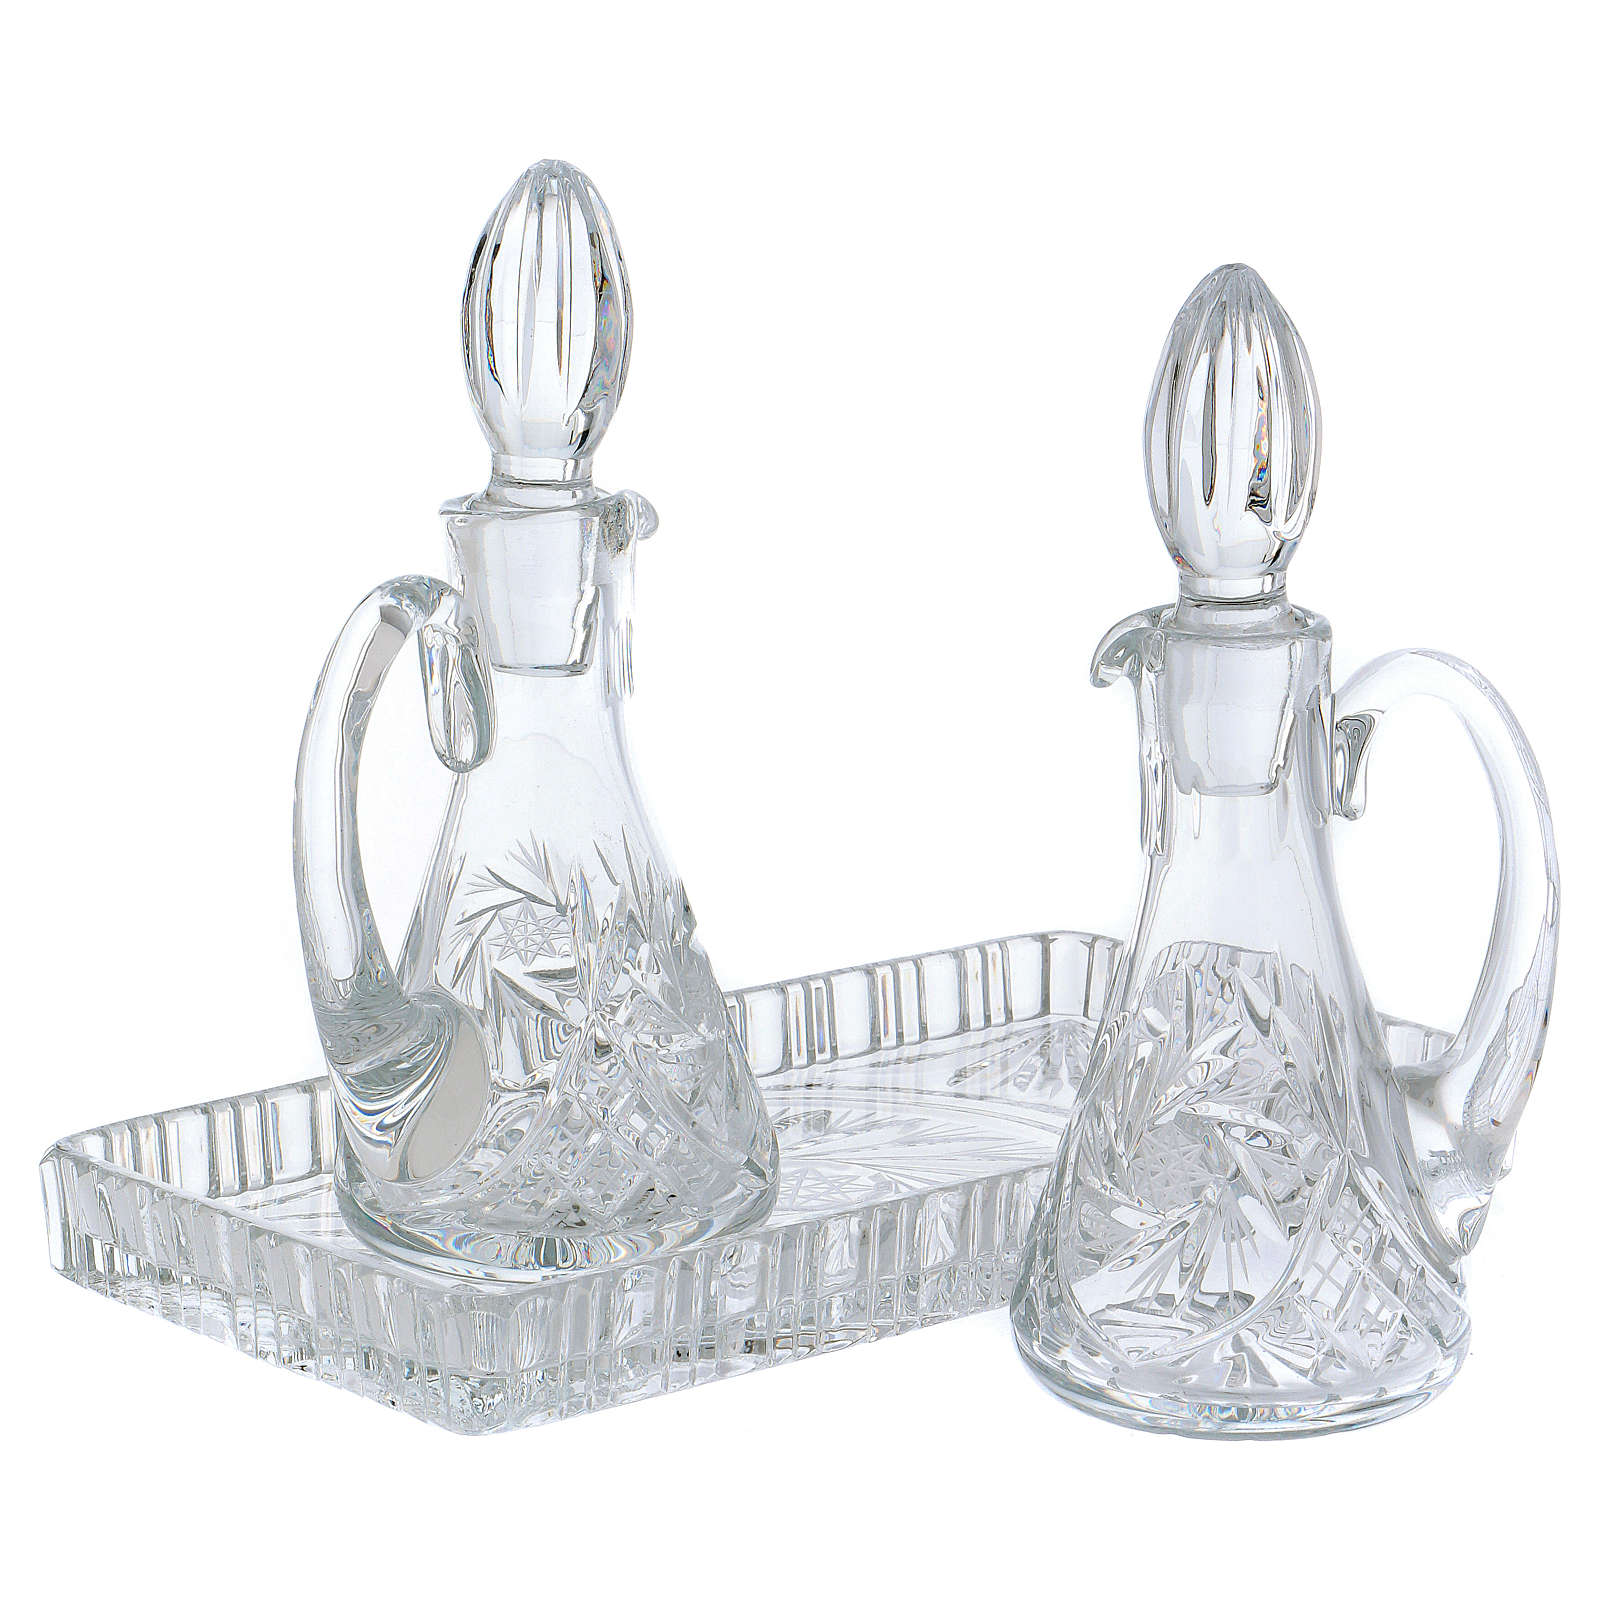 Set vinajeras misa cristal bandeja rectangular 4